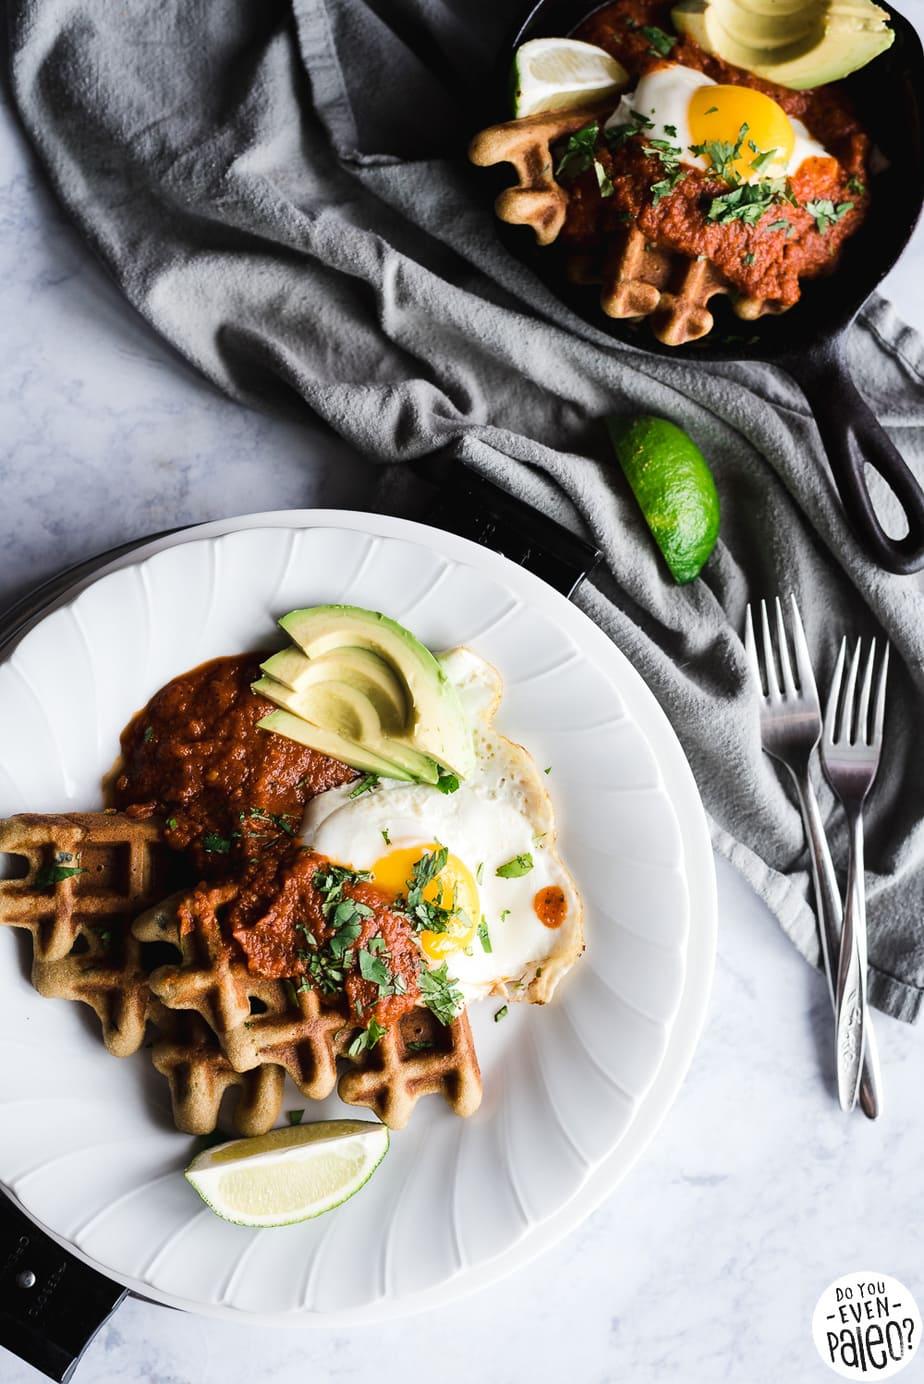 Gluten Free & Paleo Waffle Huevos Rancheros Recipe | DoYouEvenPaleo.net